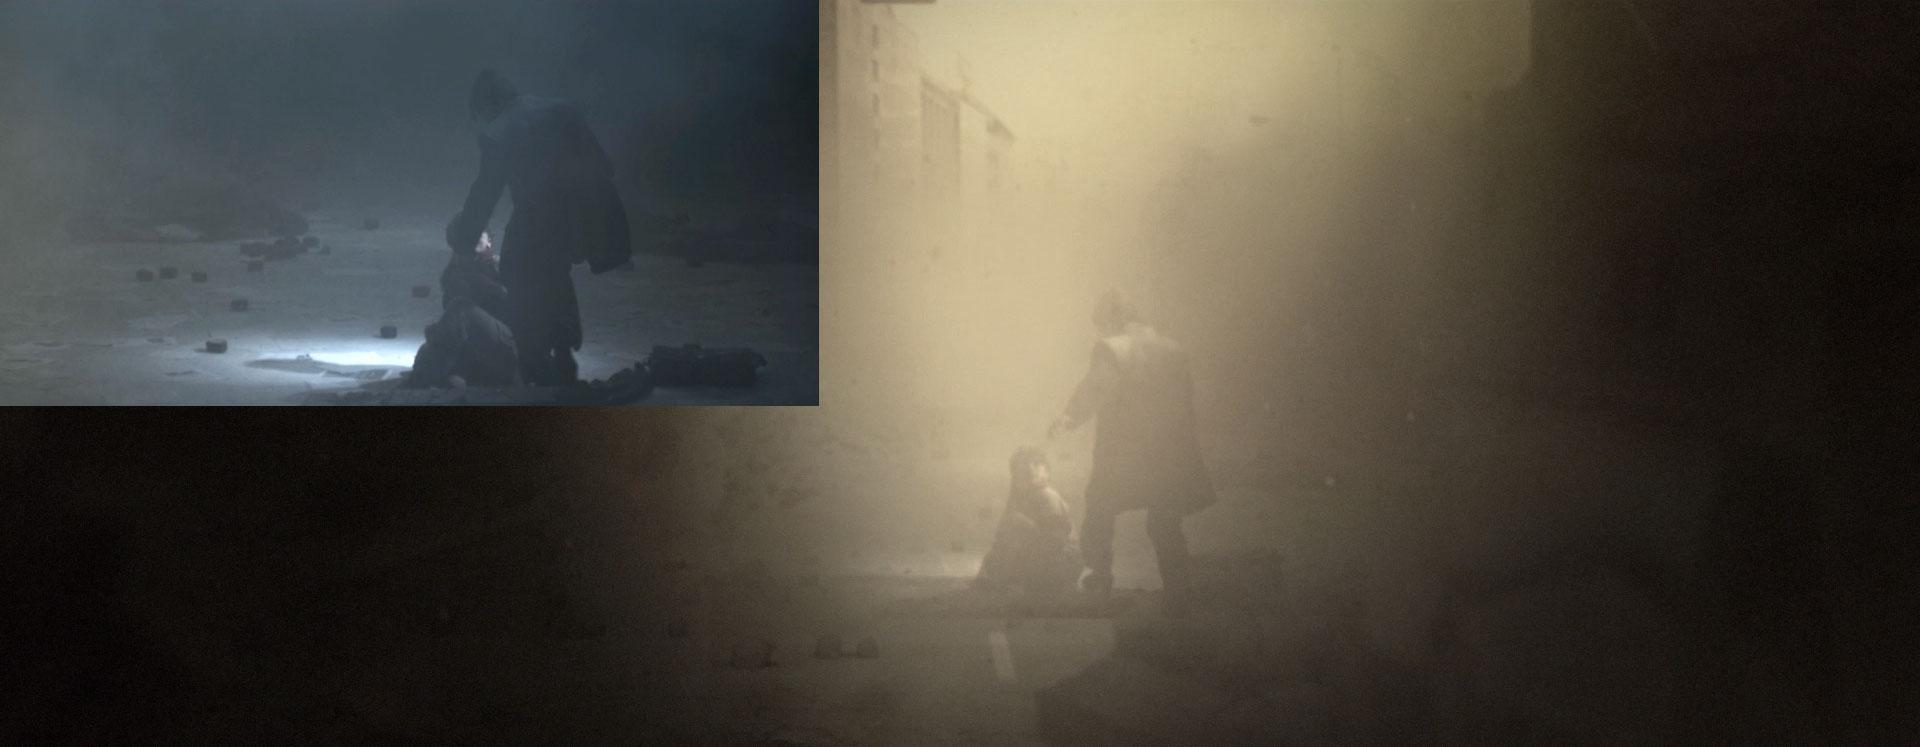 Kune-cortometraje-humo